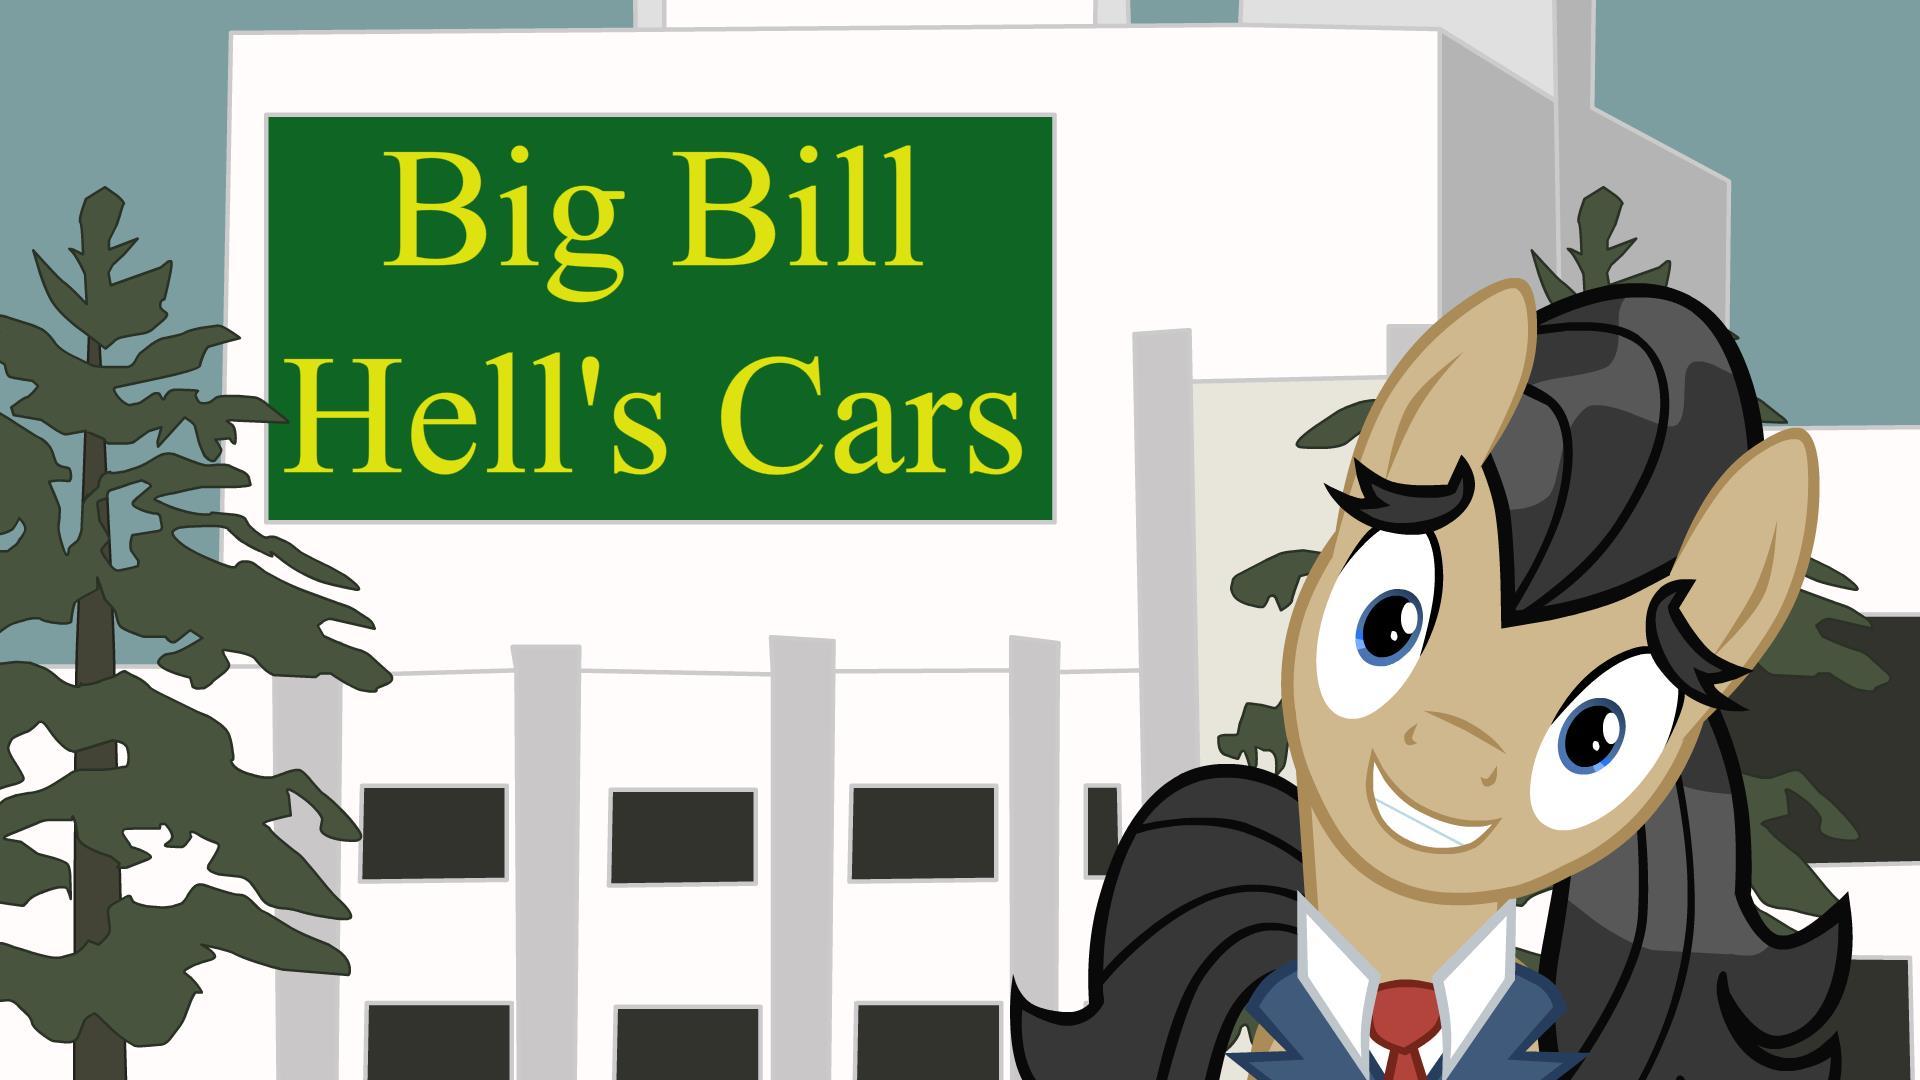 Big Bill Hells Cars (Animation)